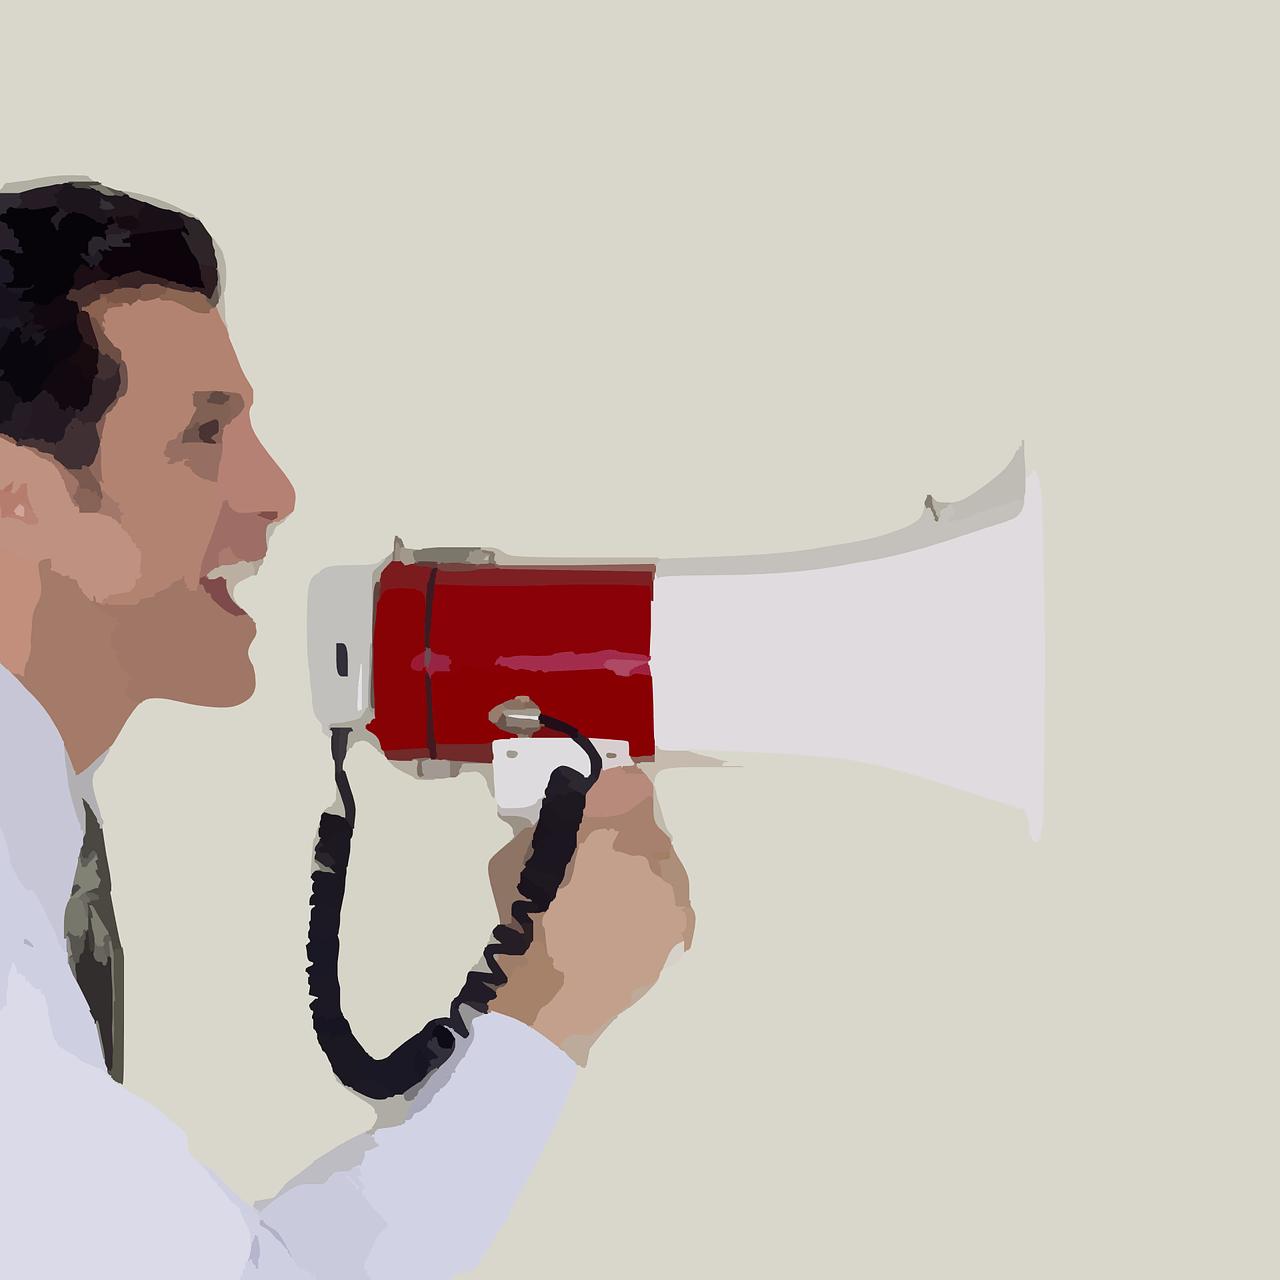 Sådan promoverer du en Zumba-klasse: Spred ordet